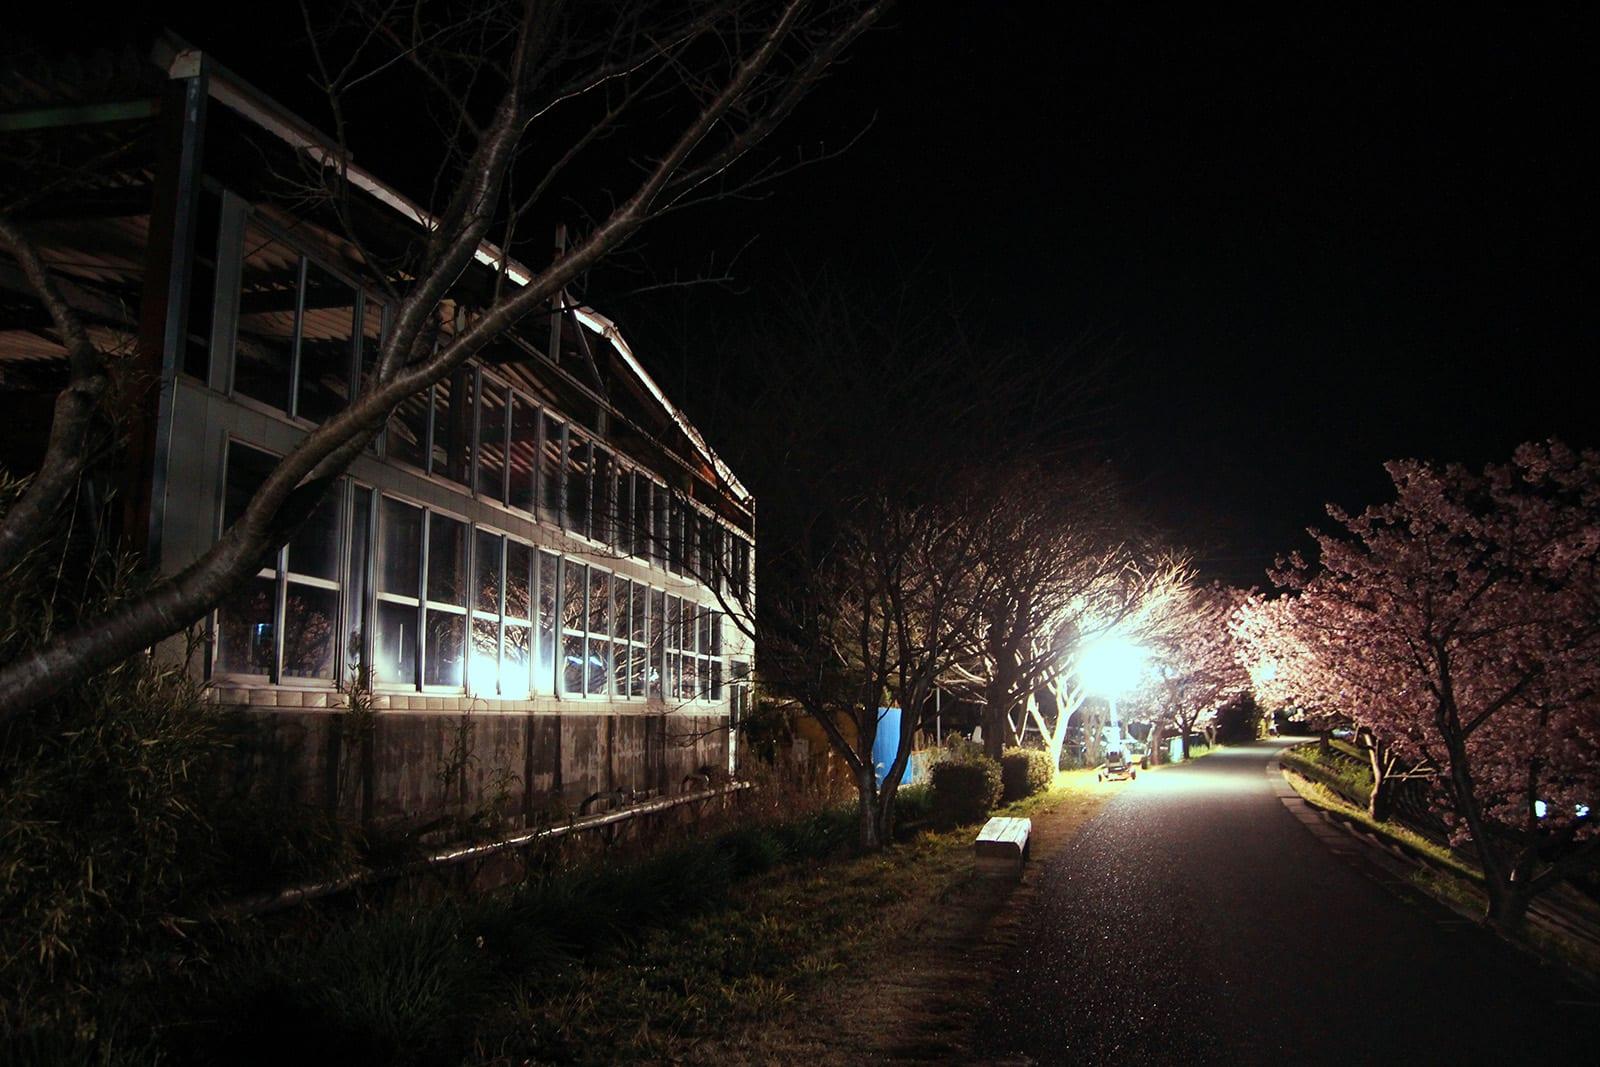 Ngắm Kawazu-zakura và trời sao tại Miurakaigan, Kanazawa-ken 10